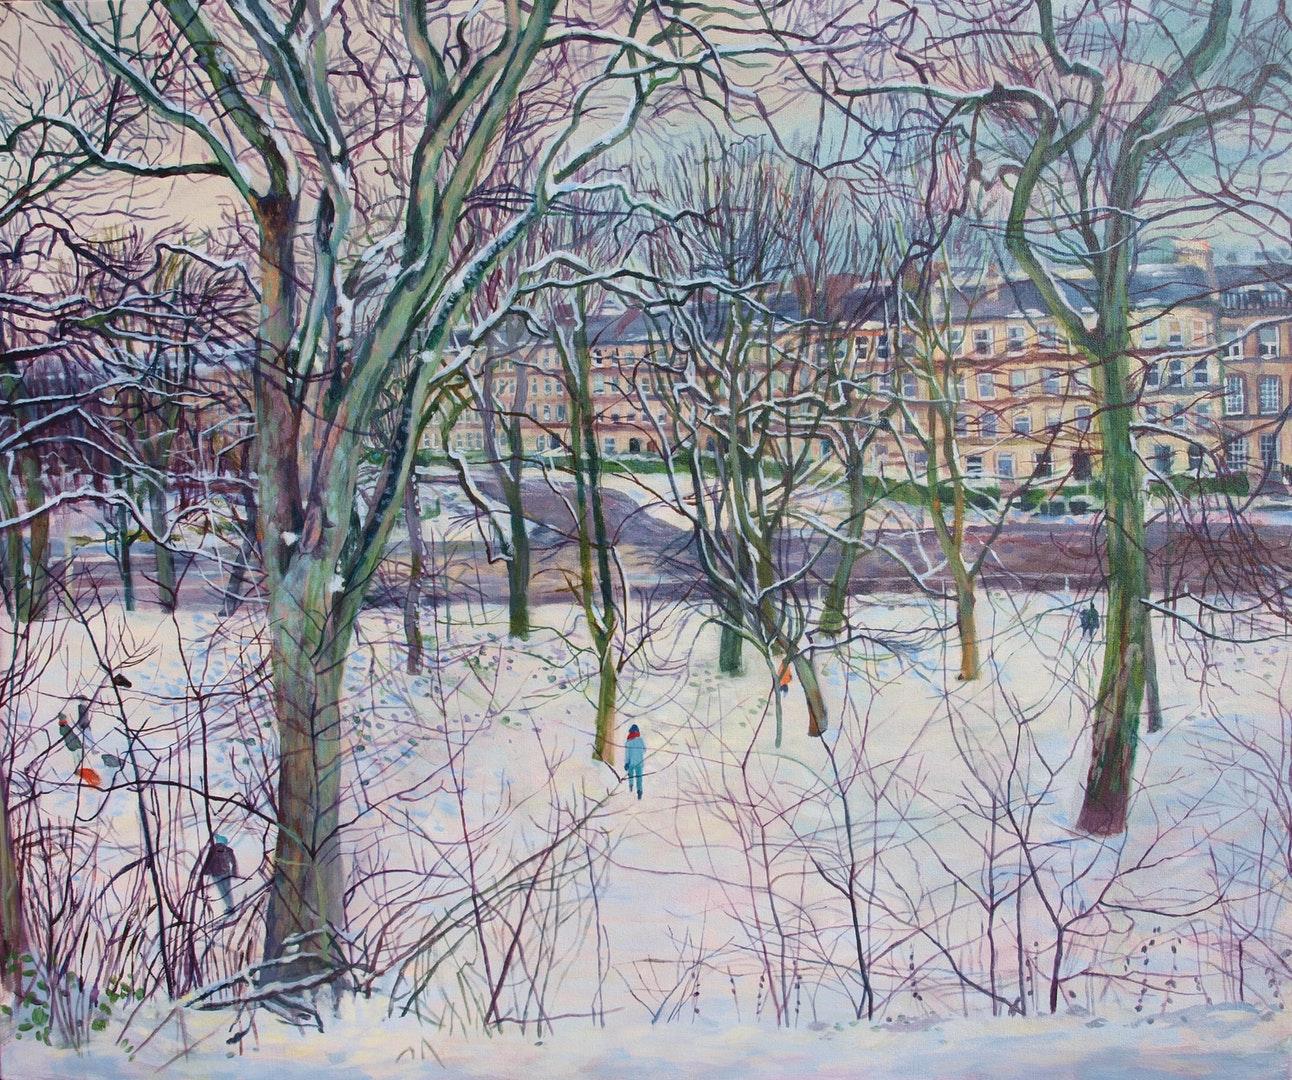 'Snow Day. London Road', Karen Laird, Acrylic on canvas, 50 x 60 cm